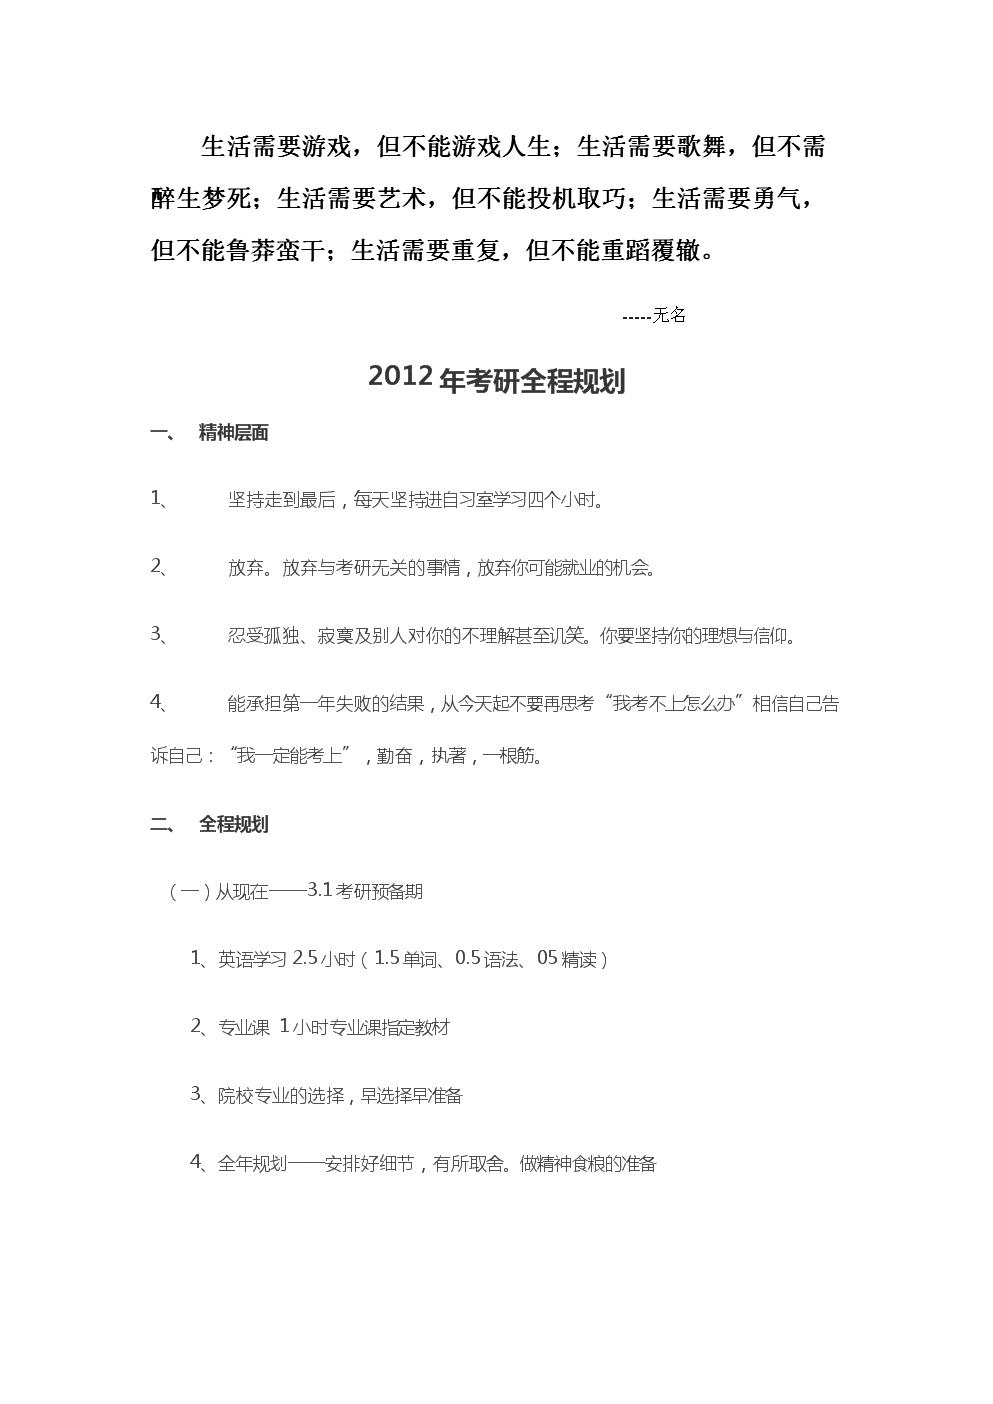 Acslxq2012年考研全程策划.doc